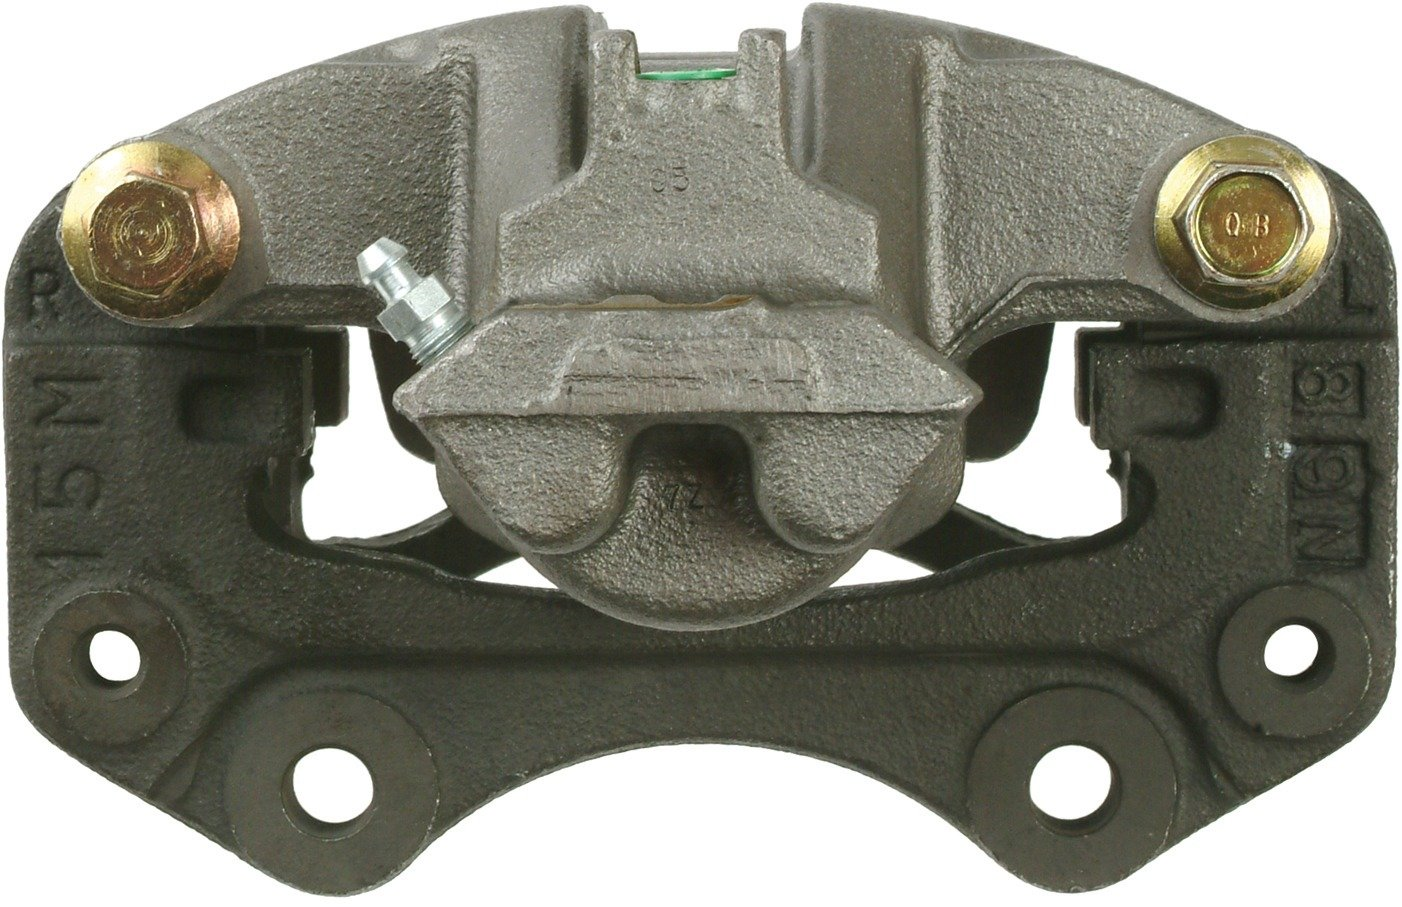 Cardone 18-B8030 Remanufactured Domestic Friction Ready (Unloaded) Brake Caliper